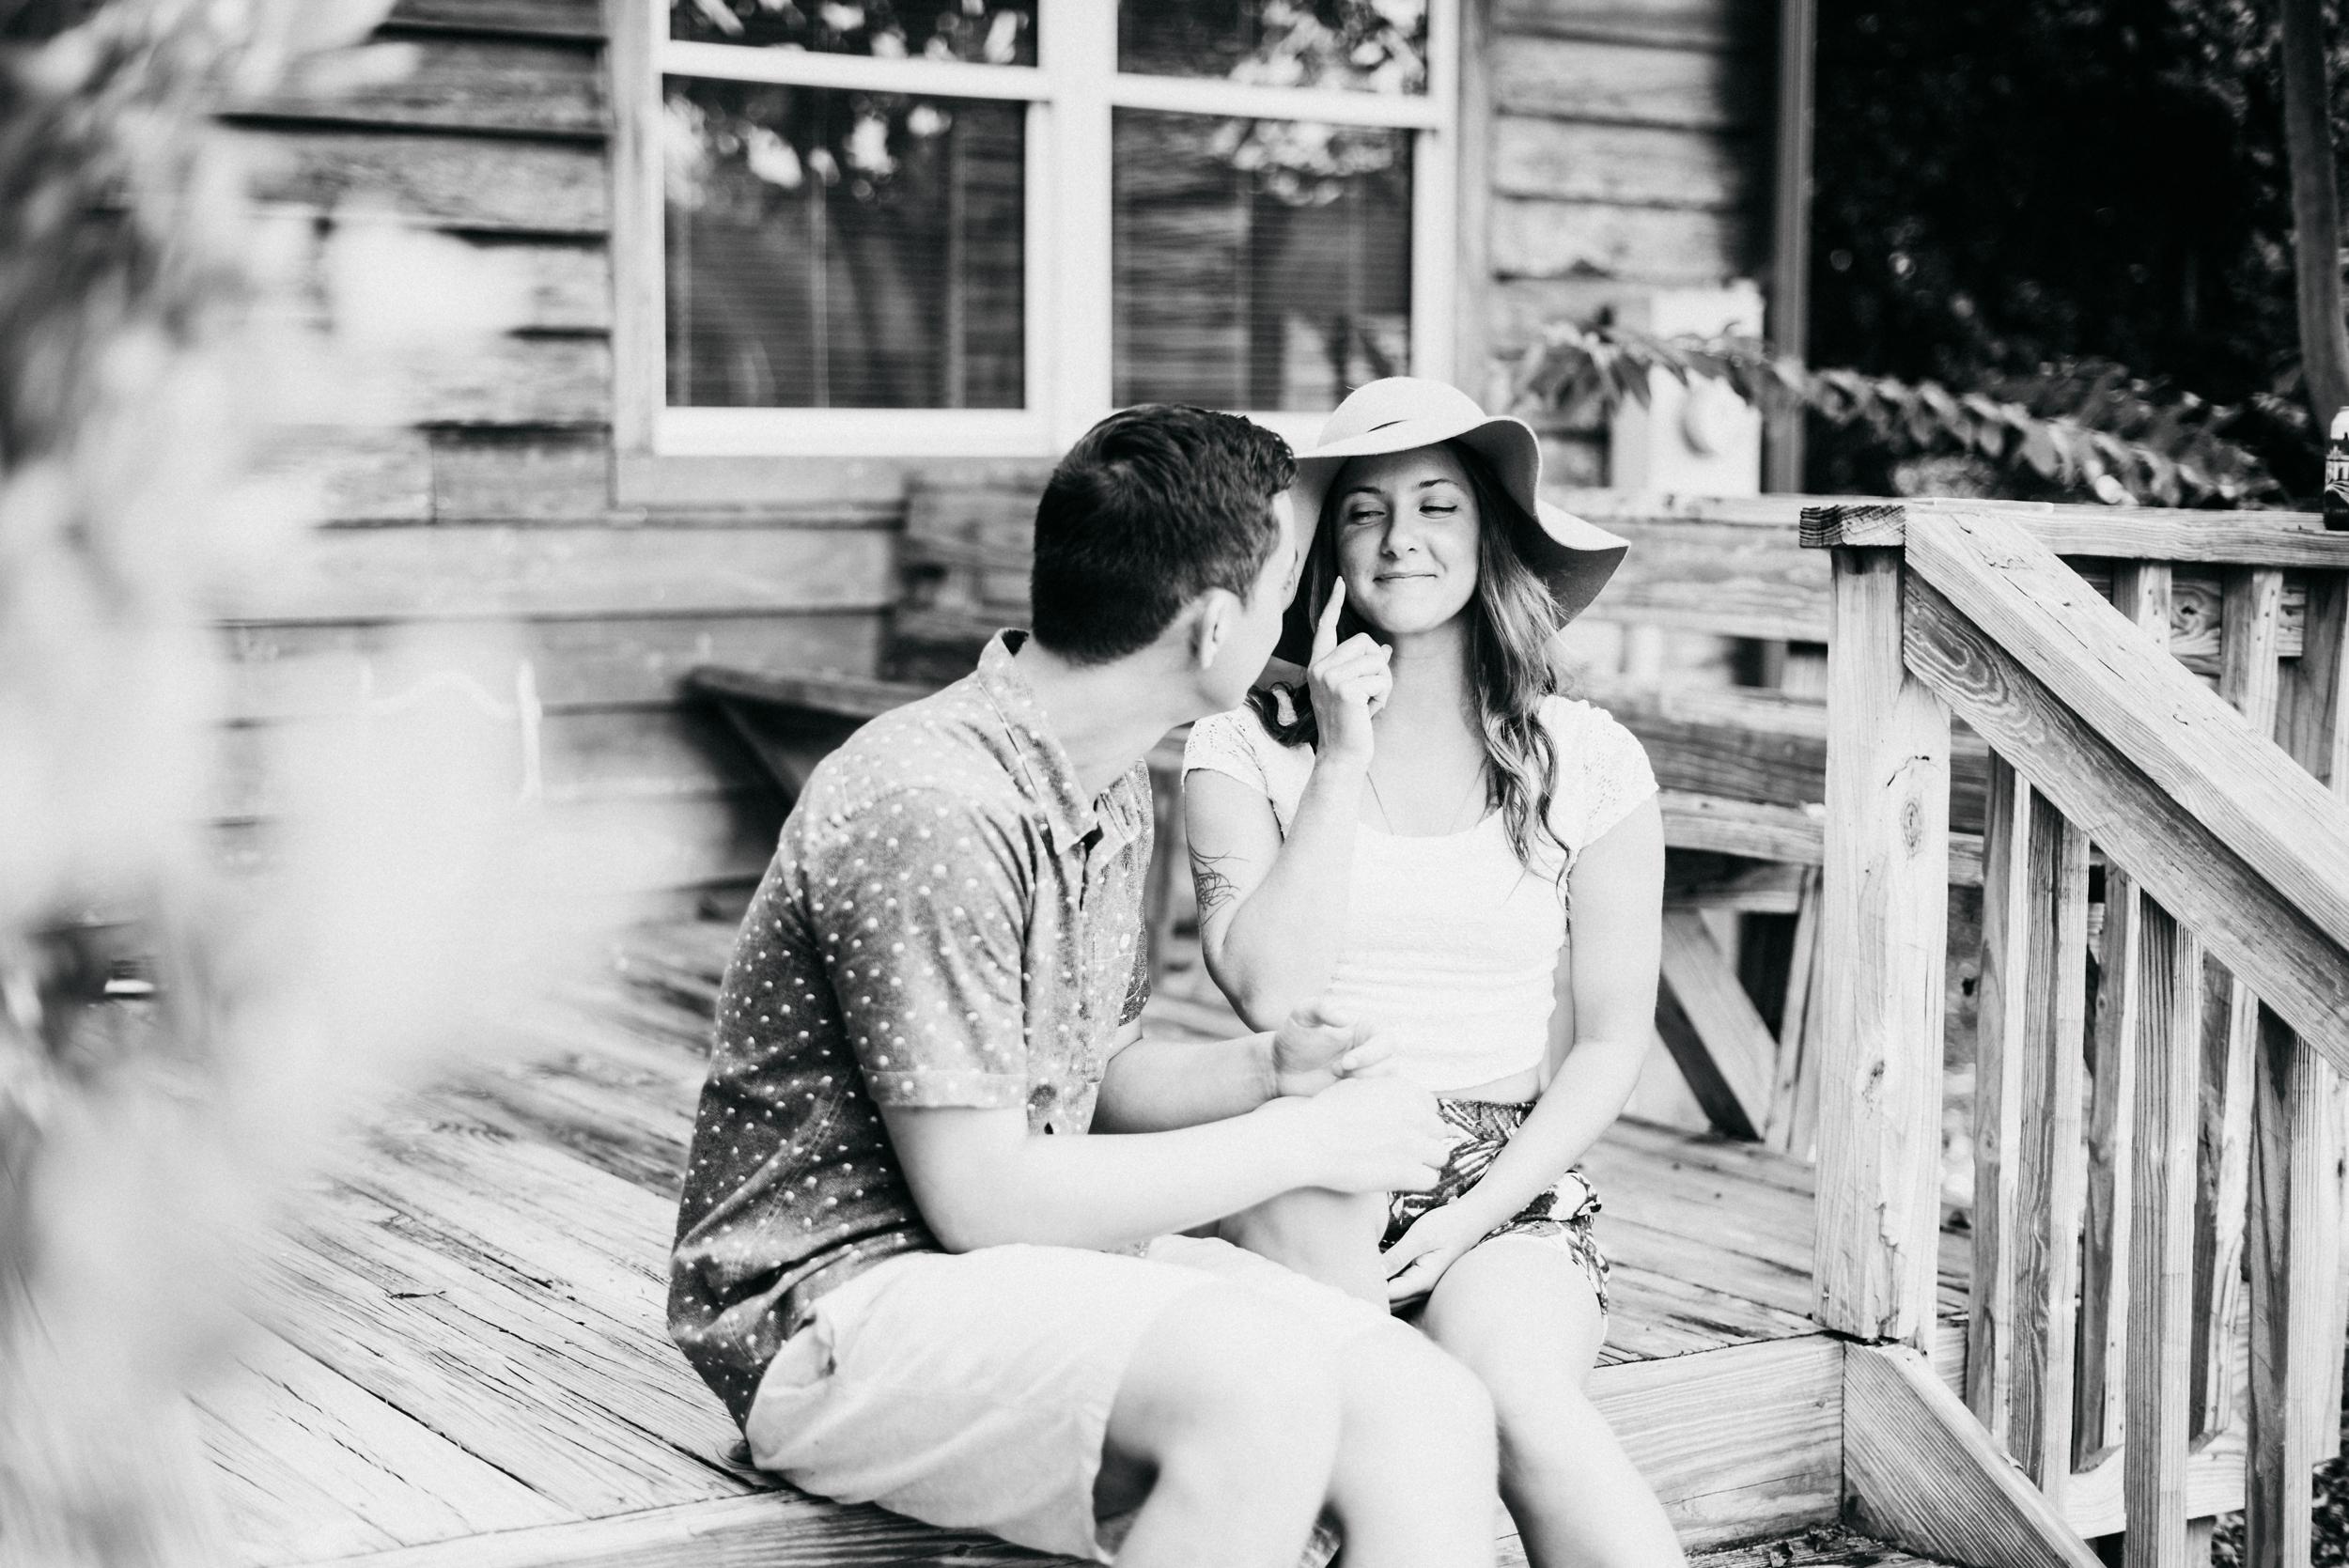 desiree-gardner-photography-pairs-france-monet-garden-monets-couple-wedding-engagement-giverny-30-a-30a-florida_0039.jpg